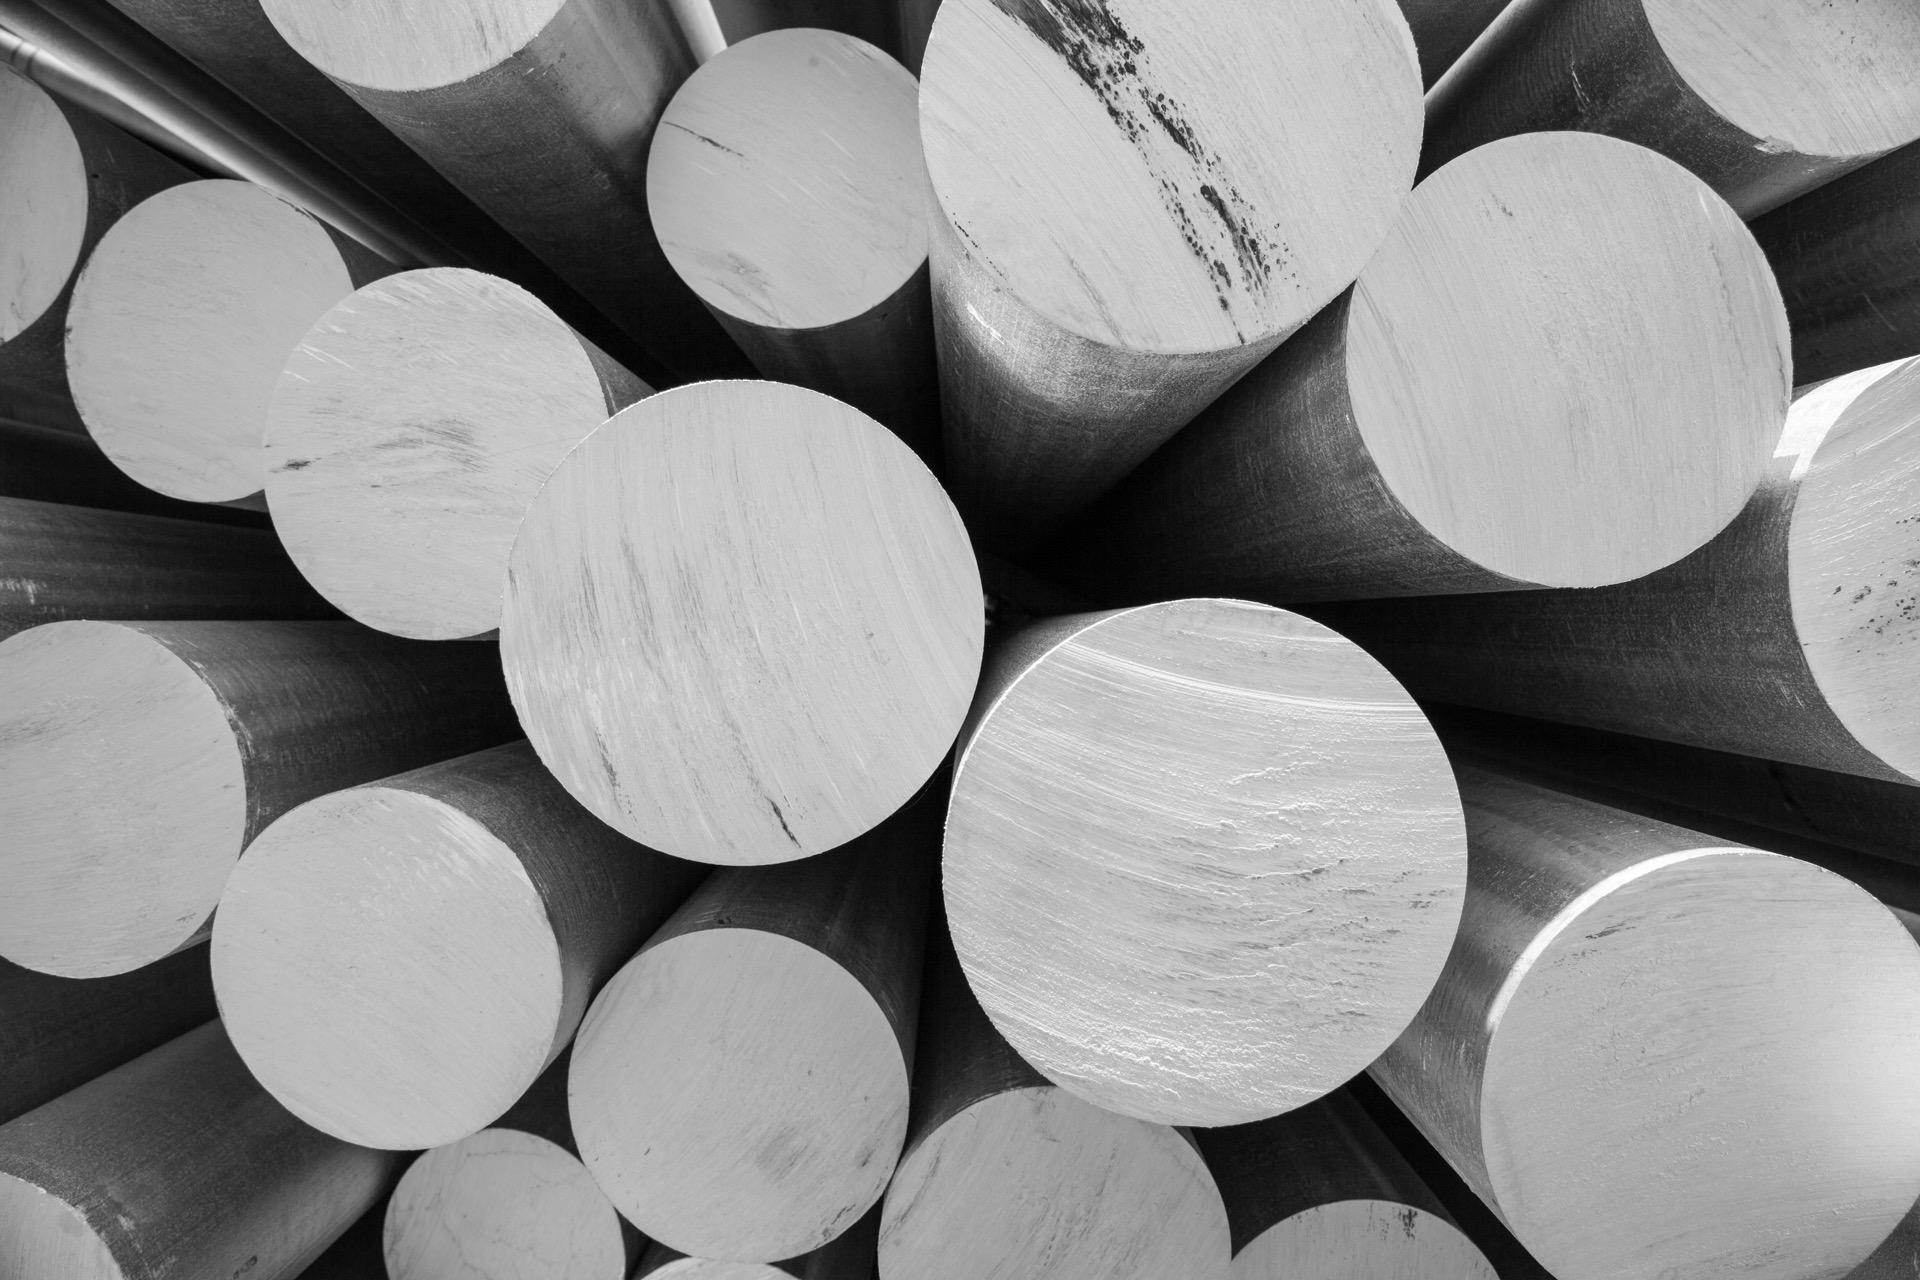 Work hardened aluminum